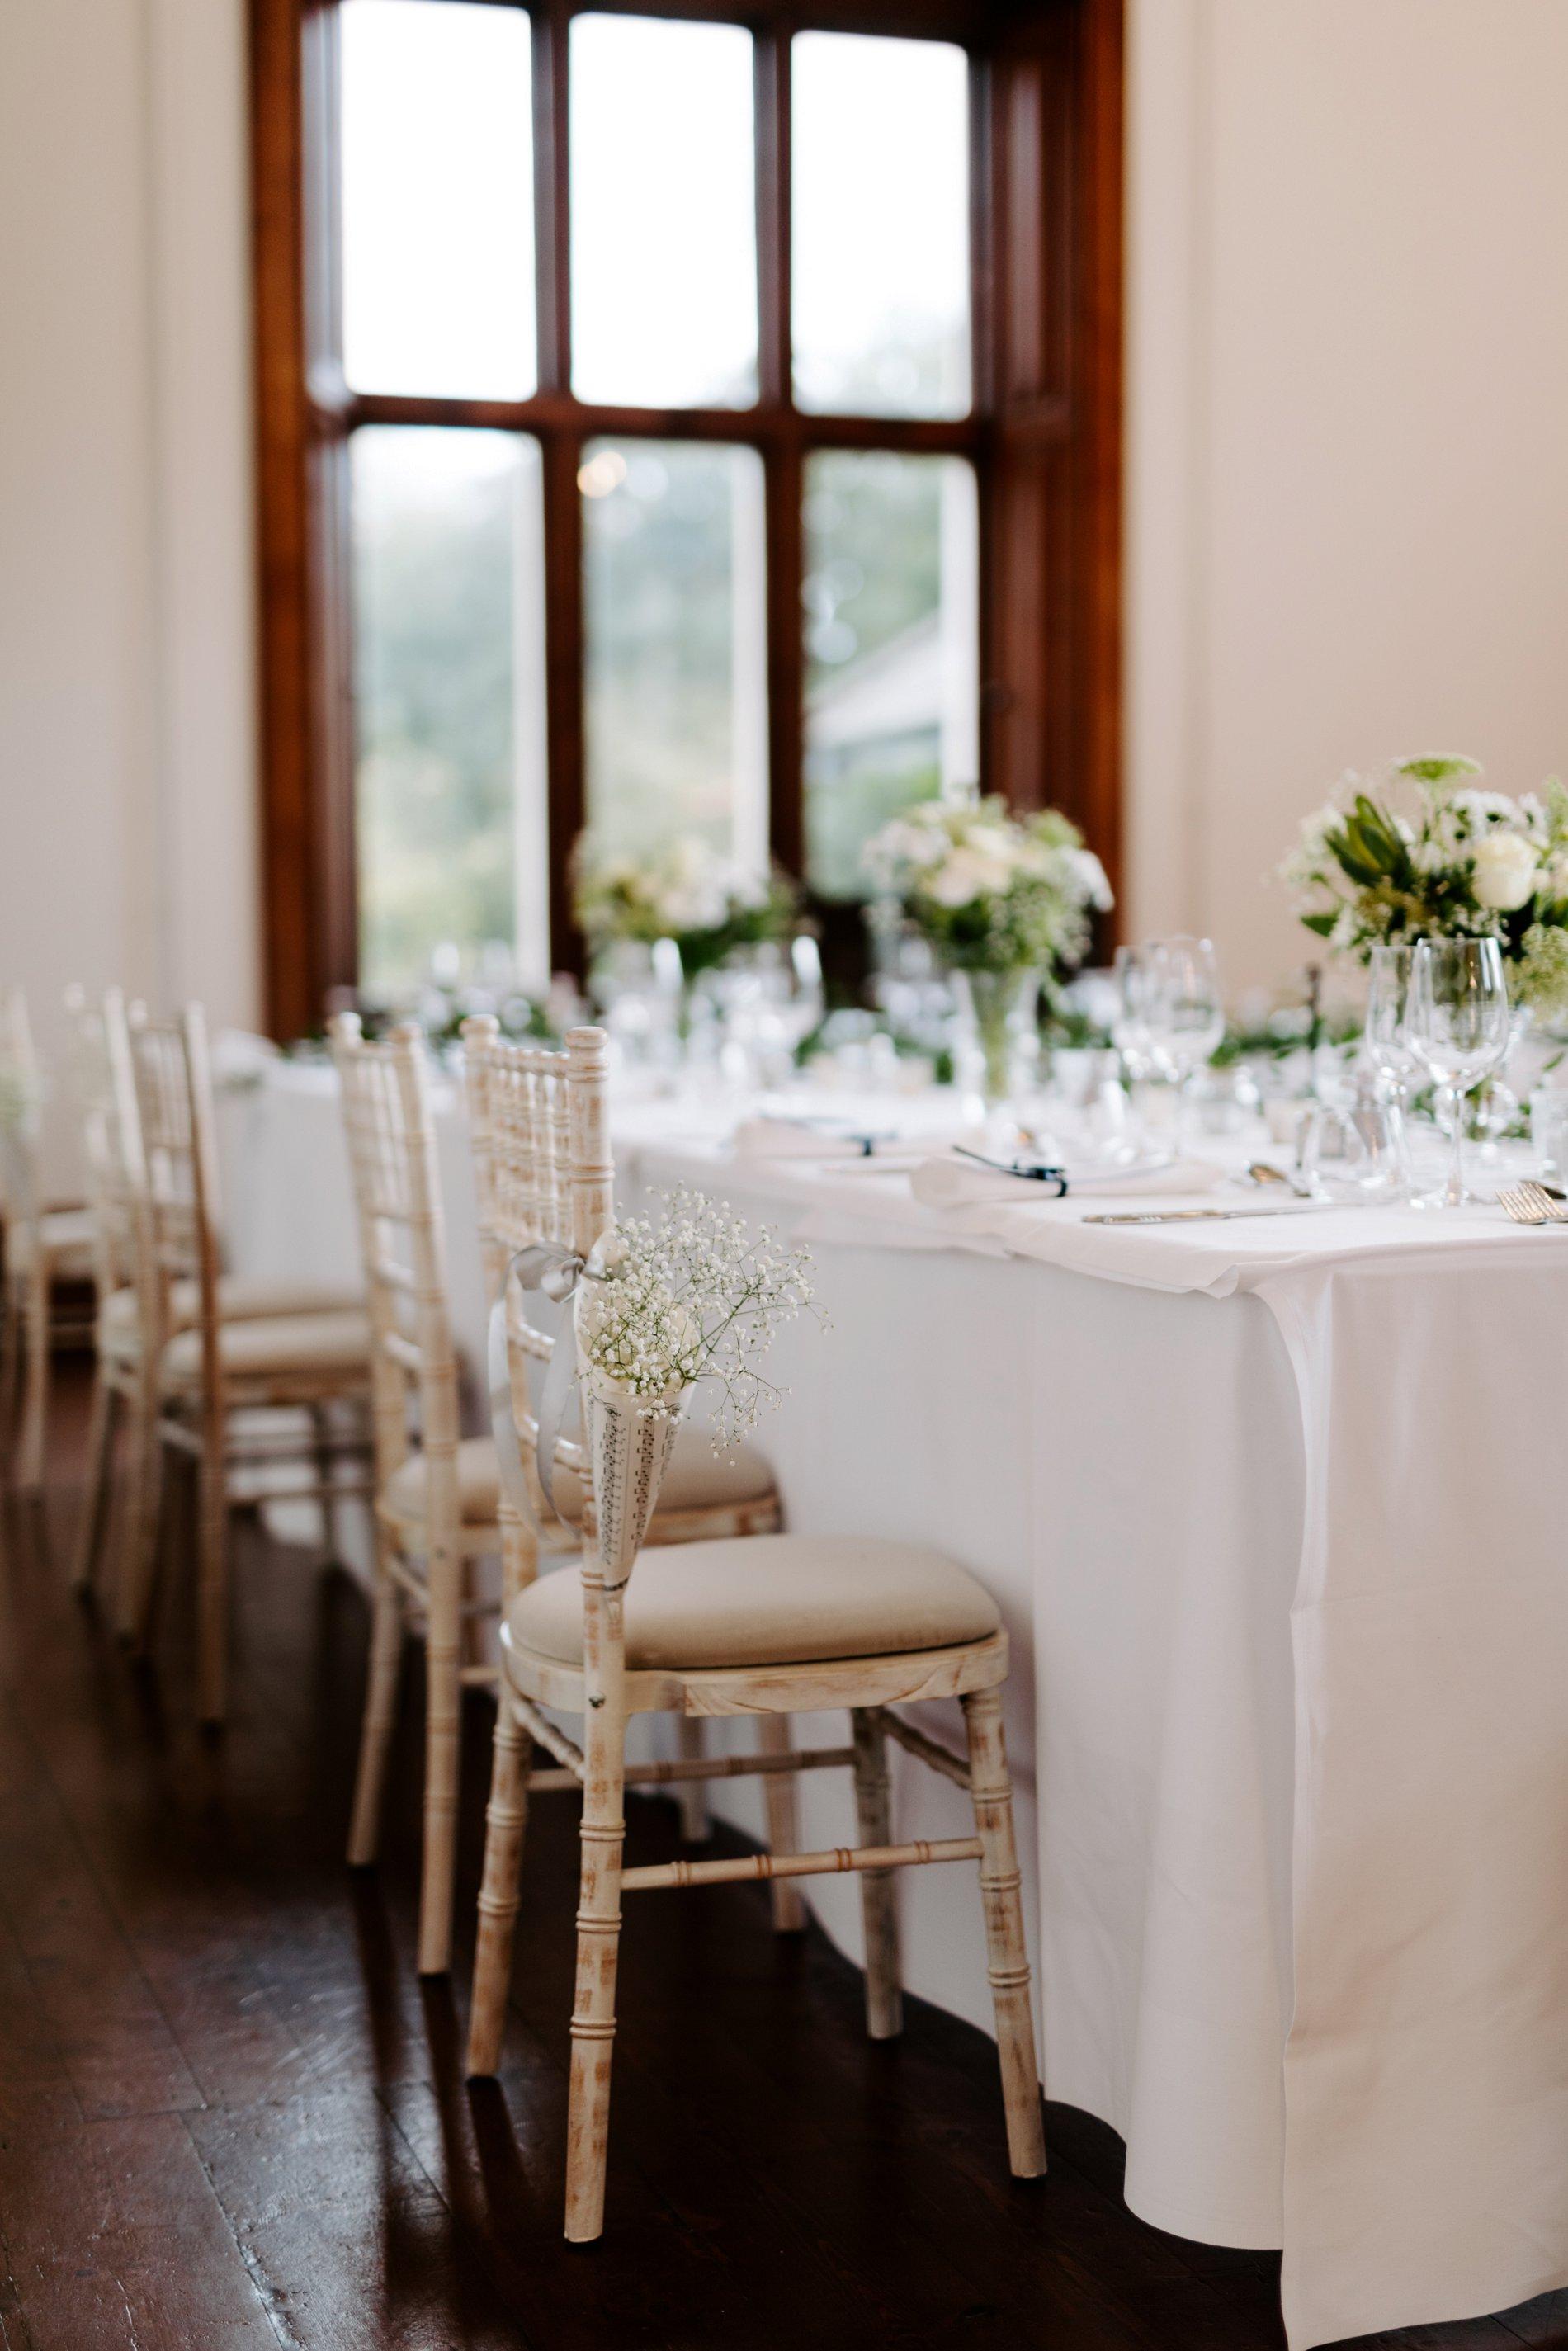 An Elegant White Wedding at Thicket Priory (c) Carla Whittingham Photography (47)